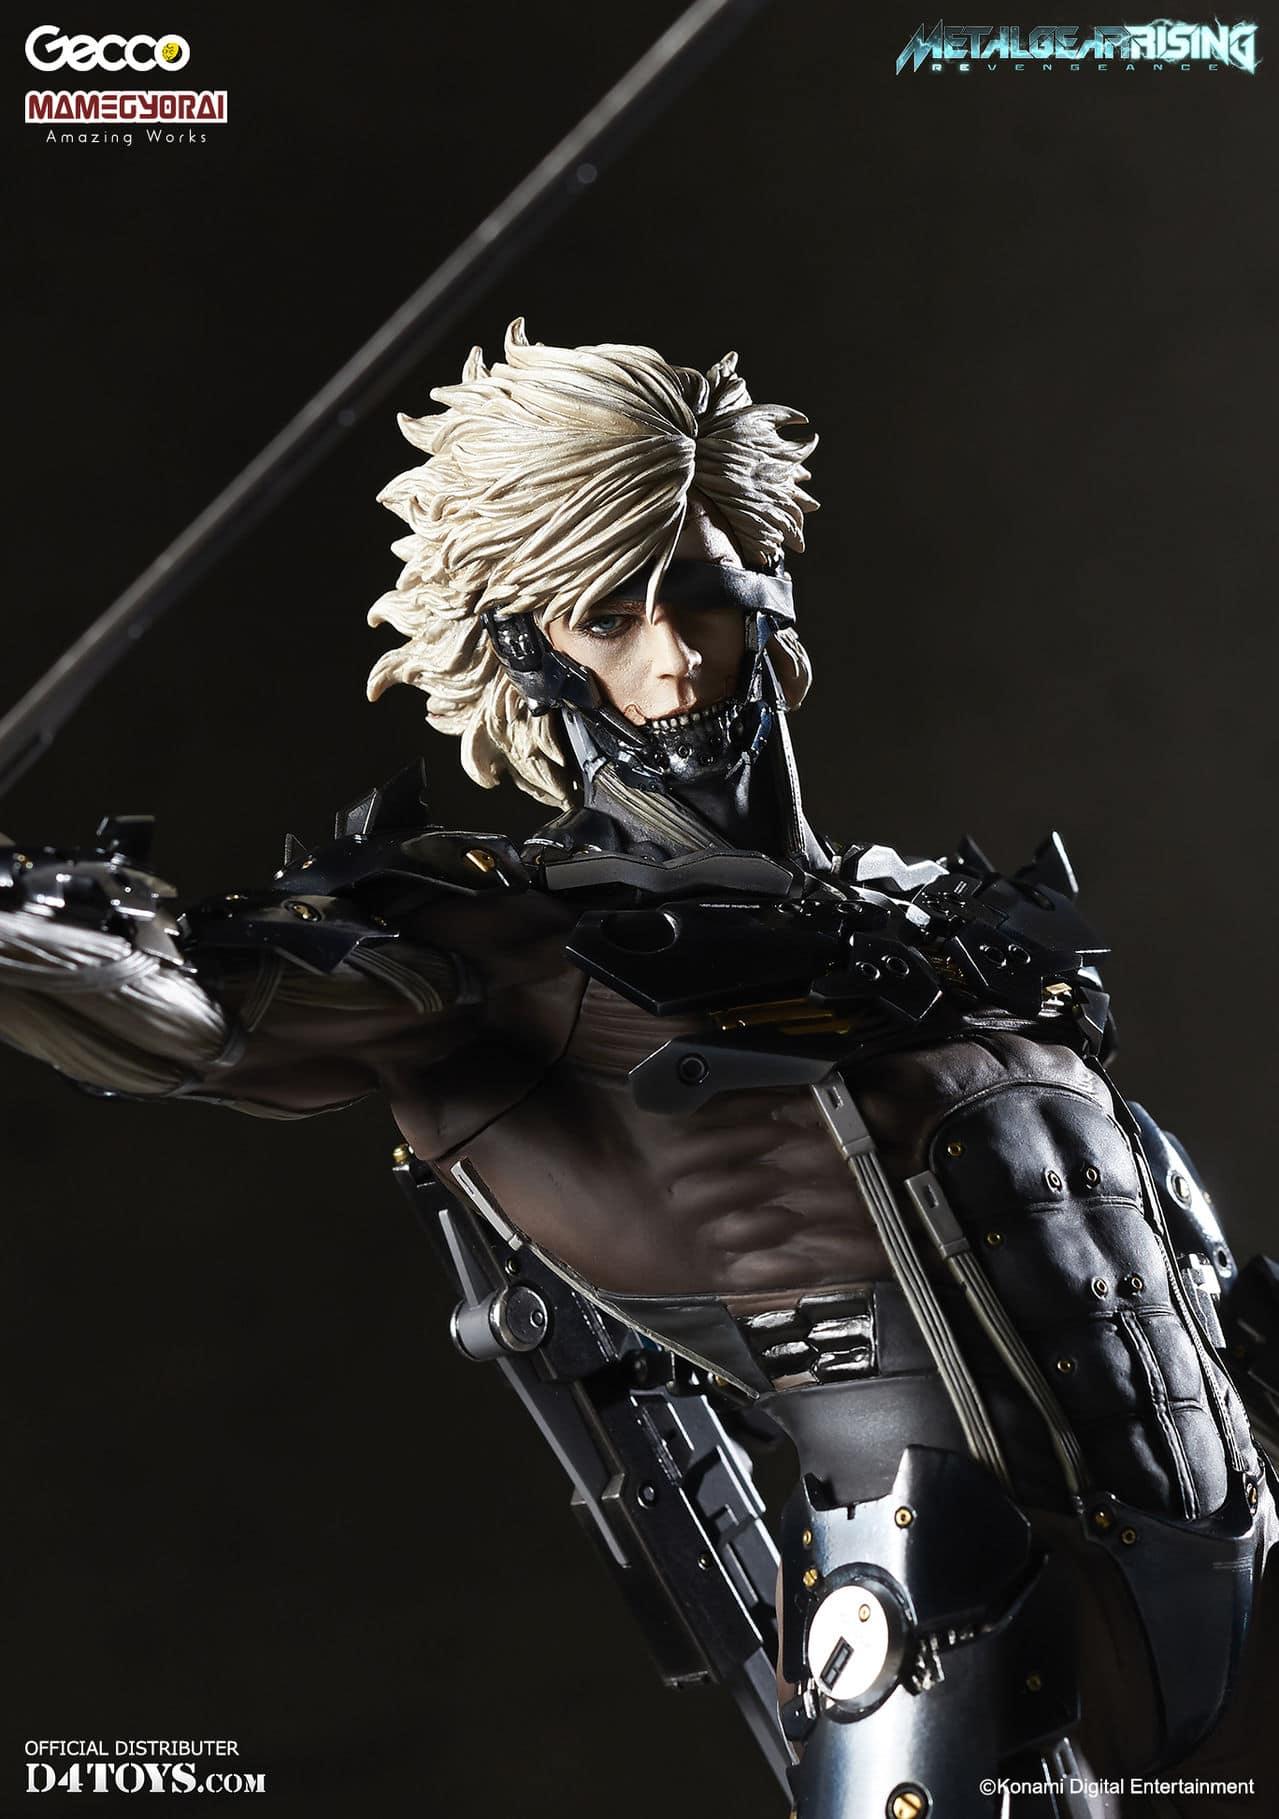 [Gecco,  Mamegyorai] Metal Gear Rising: Revengeance - RAIDEN White Armor 1/6 - SDCC2015 Exclusive - Página 2 D4_004